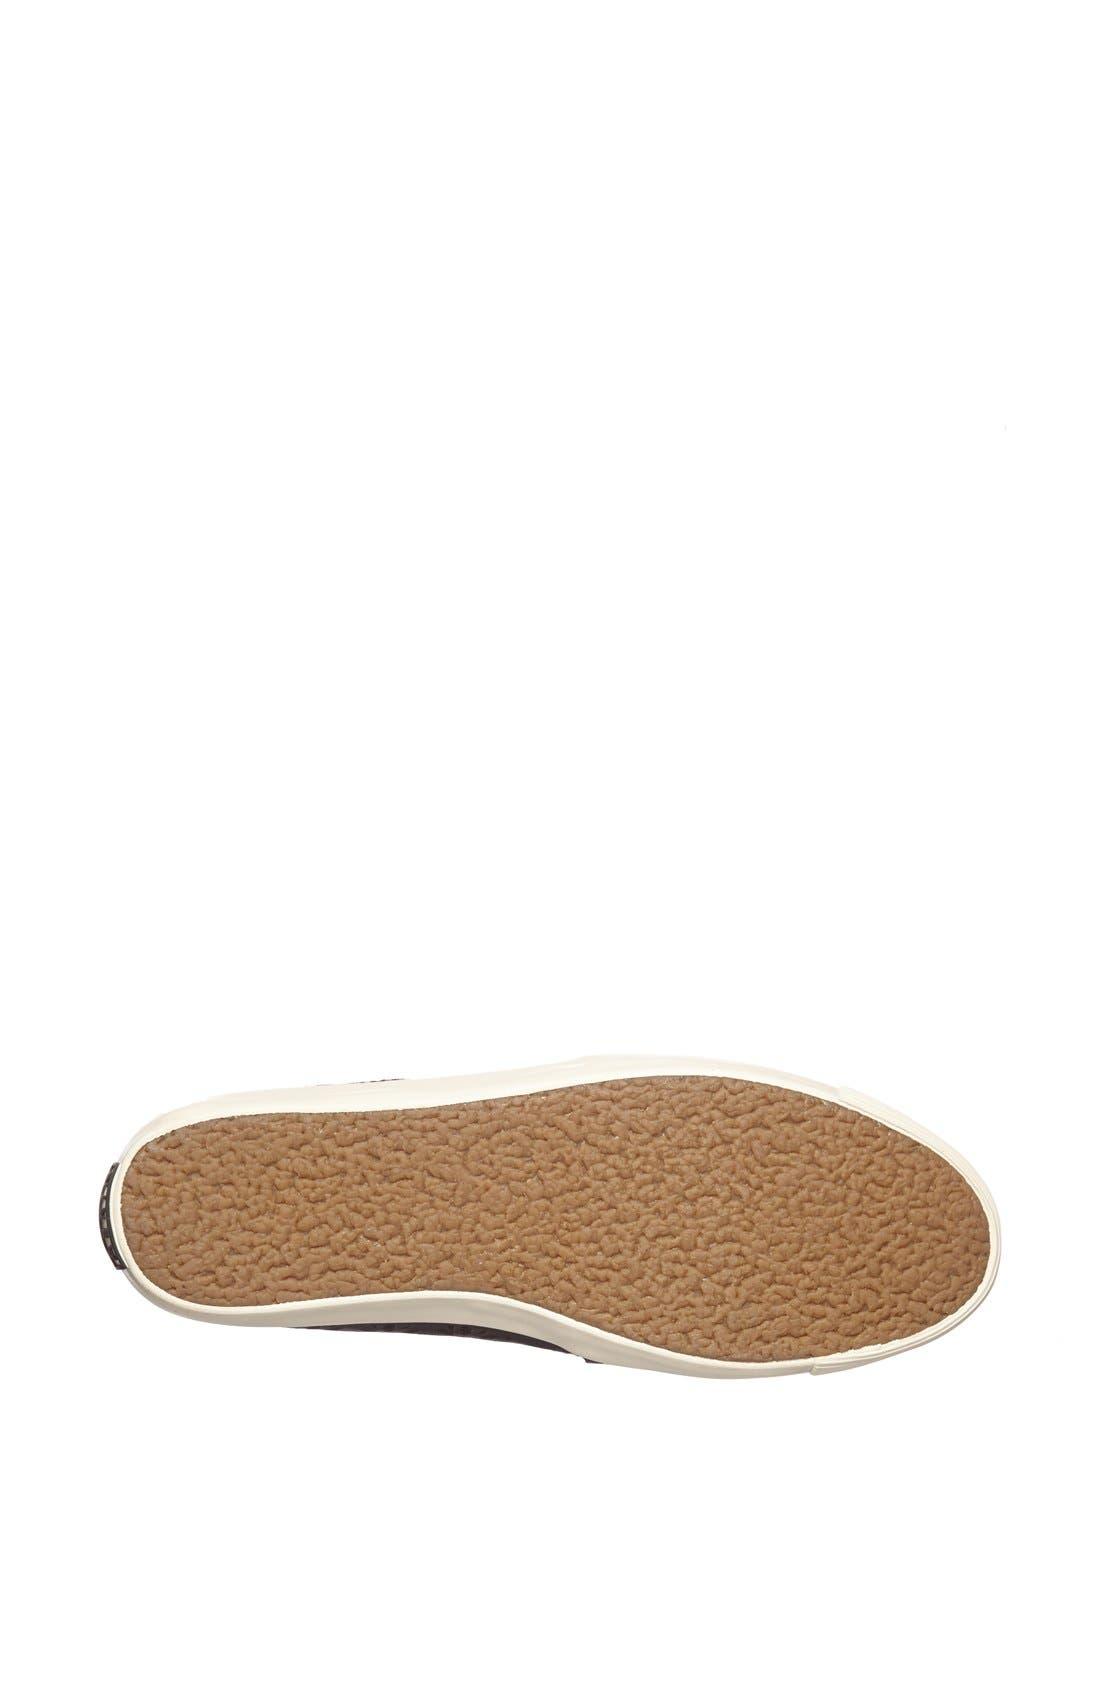 AERIN,                             'Murex' Perforated Slip-On Sneaker,                             Alternate thumbnail 3, color,                             001